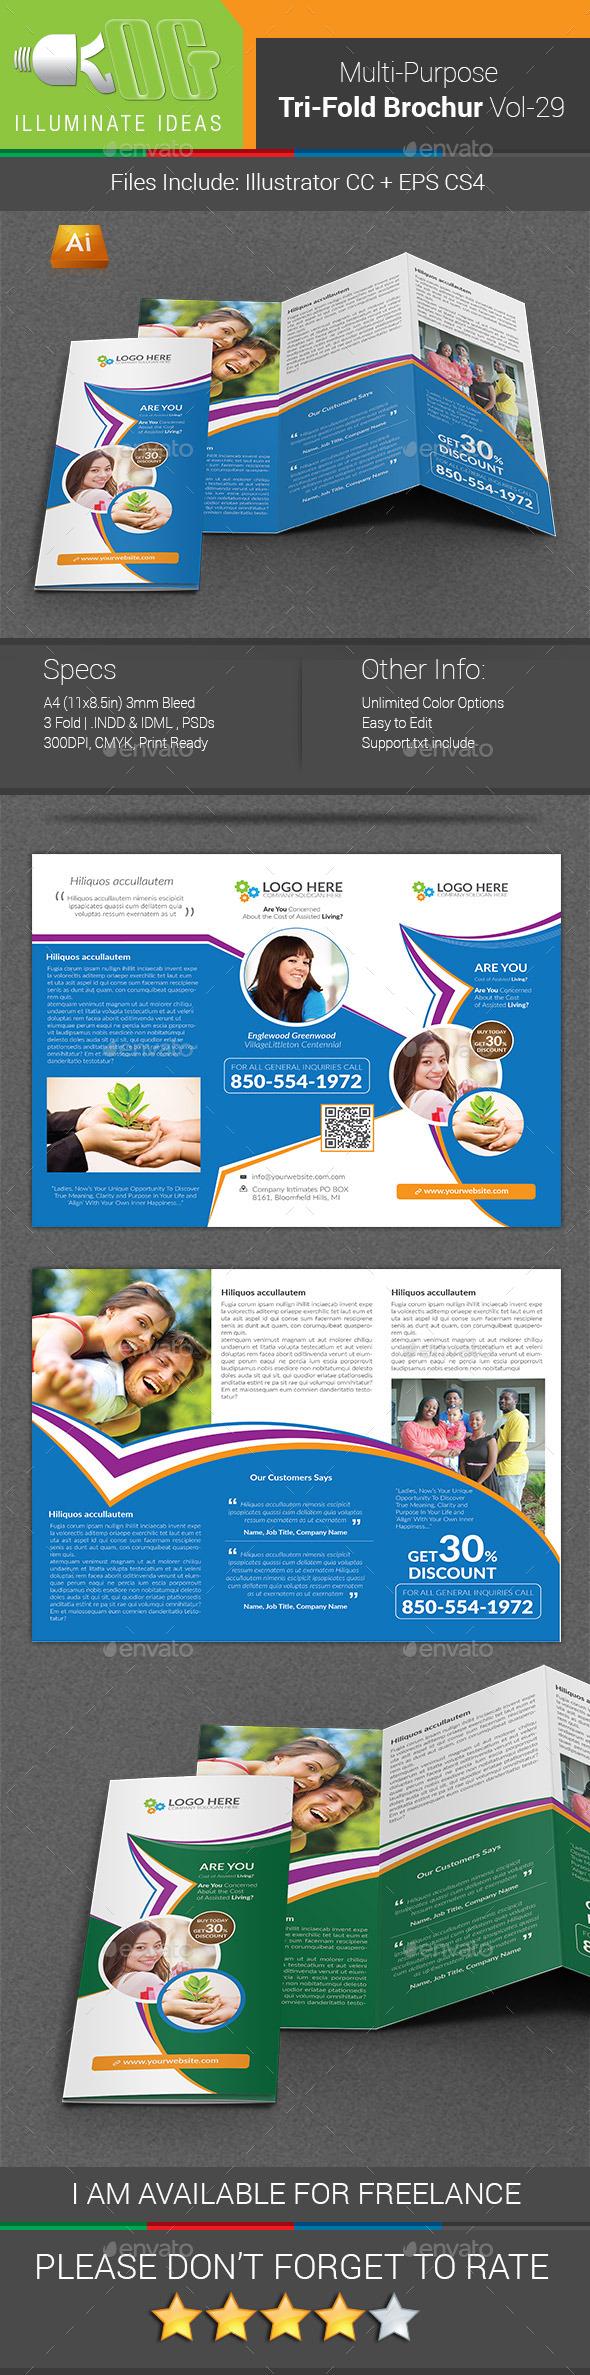 Multipurpose Business Tri-Fold Brochure Vol-29 - Corporate Brochures